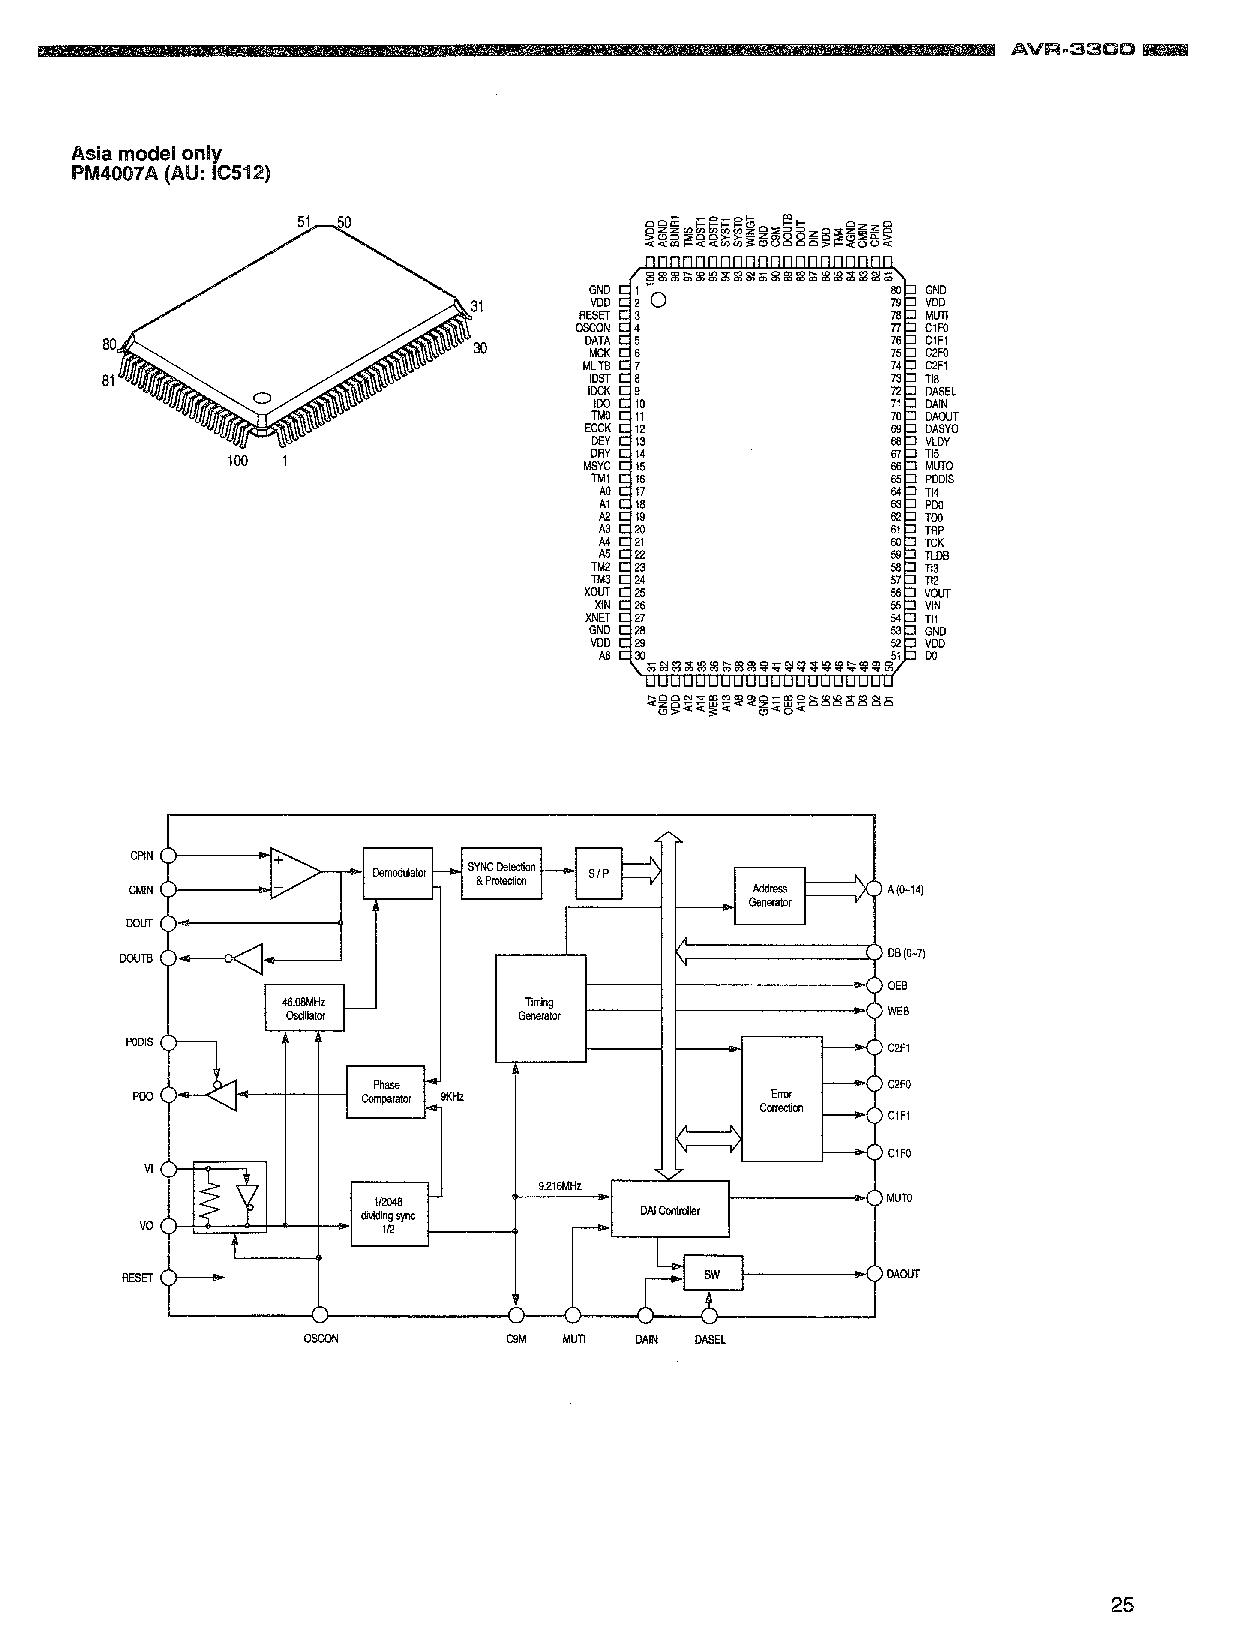 Denon avr3300 Service Manual